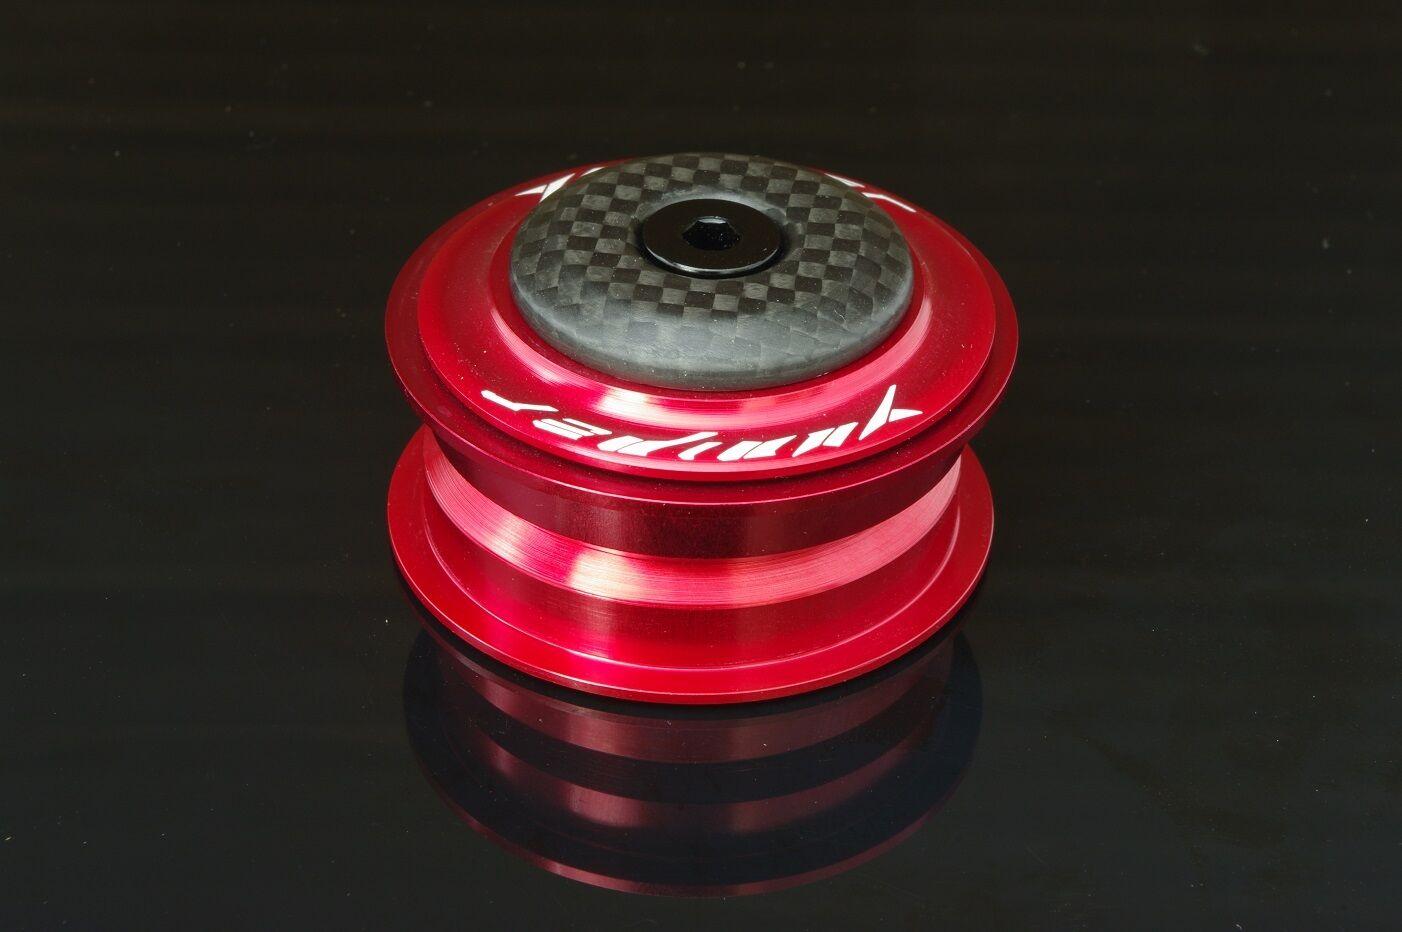 Yuniper 1 1 8 tipo impositivo Ultralight  65g 44 mm rojo semi-integra fácilmente Cochebon  oferta de tienda